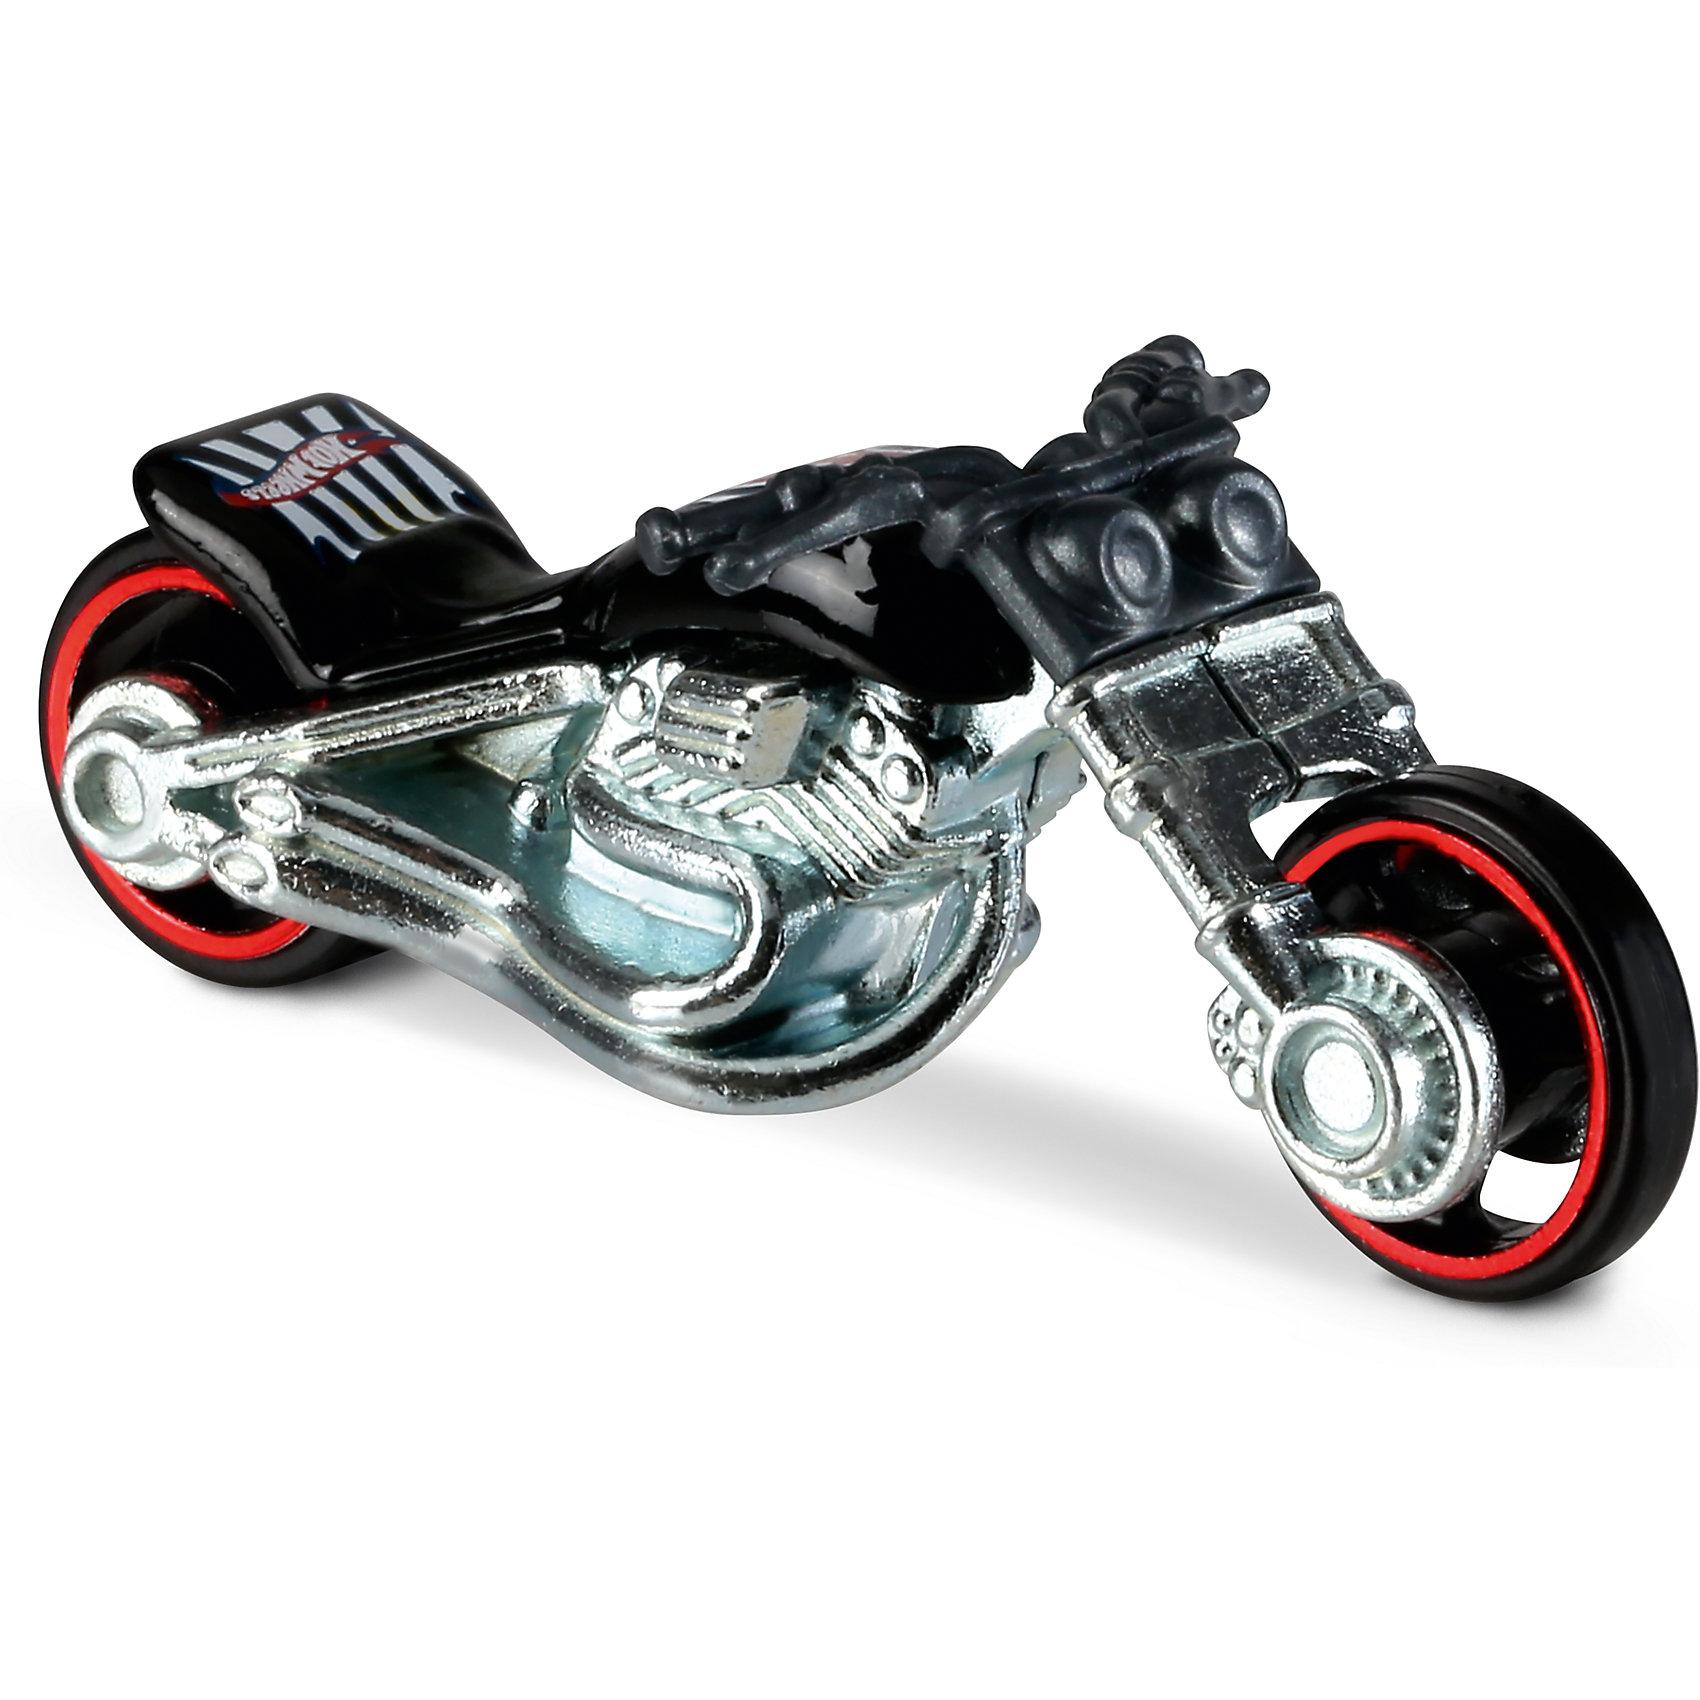 Базовая машинка Hot Wheels, Blast LaneПопулярные игрушки<br><br><br>Ширина мм: 110<br>Глубина мм: 45<br>Высота мм: 110<br>Вес г: 30<br>Возраст от месяцев: 36<br>Возраст до месяцев: 96<br>Пол: Мужской<br>Возраст: Детский<br>SKU: 7111101